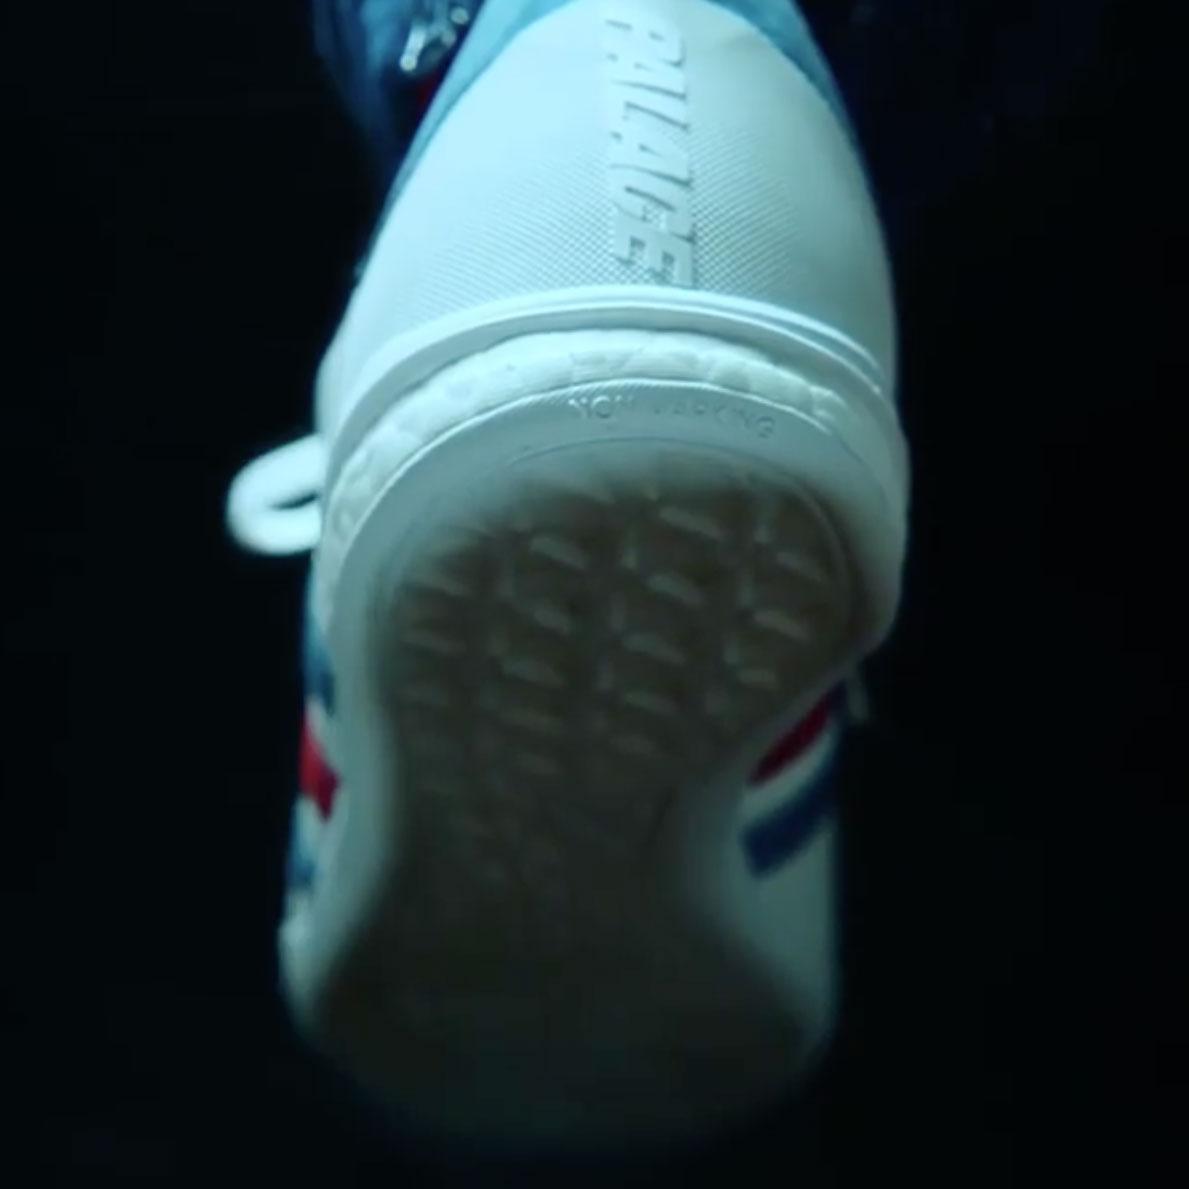 palace-adidas-originals-fall-winter-2016-sneaker-teaser-1